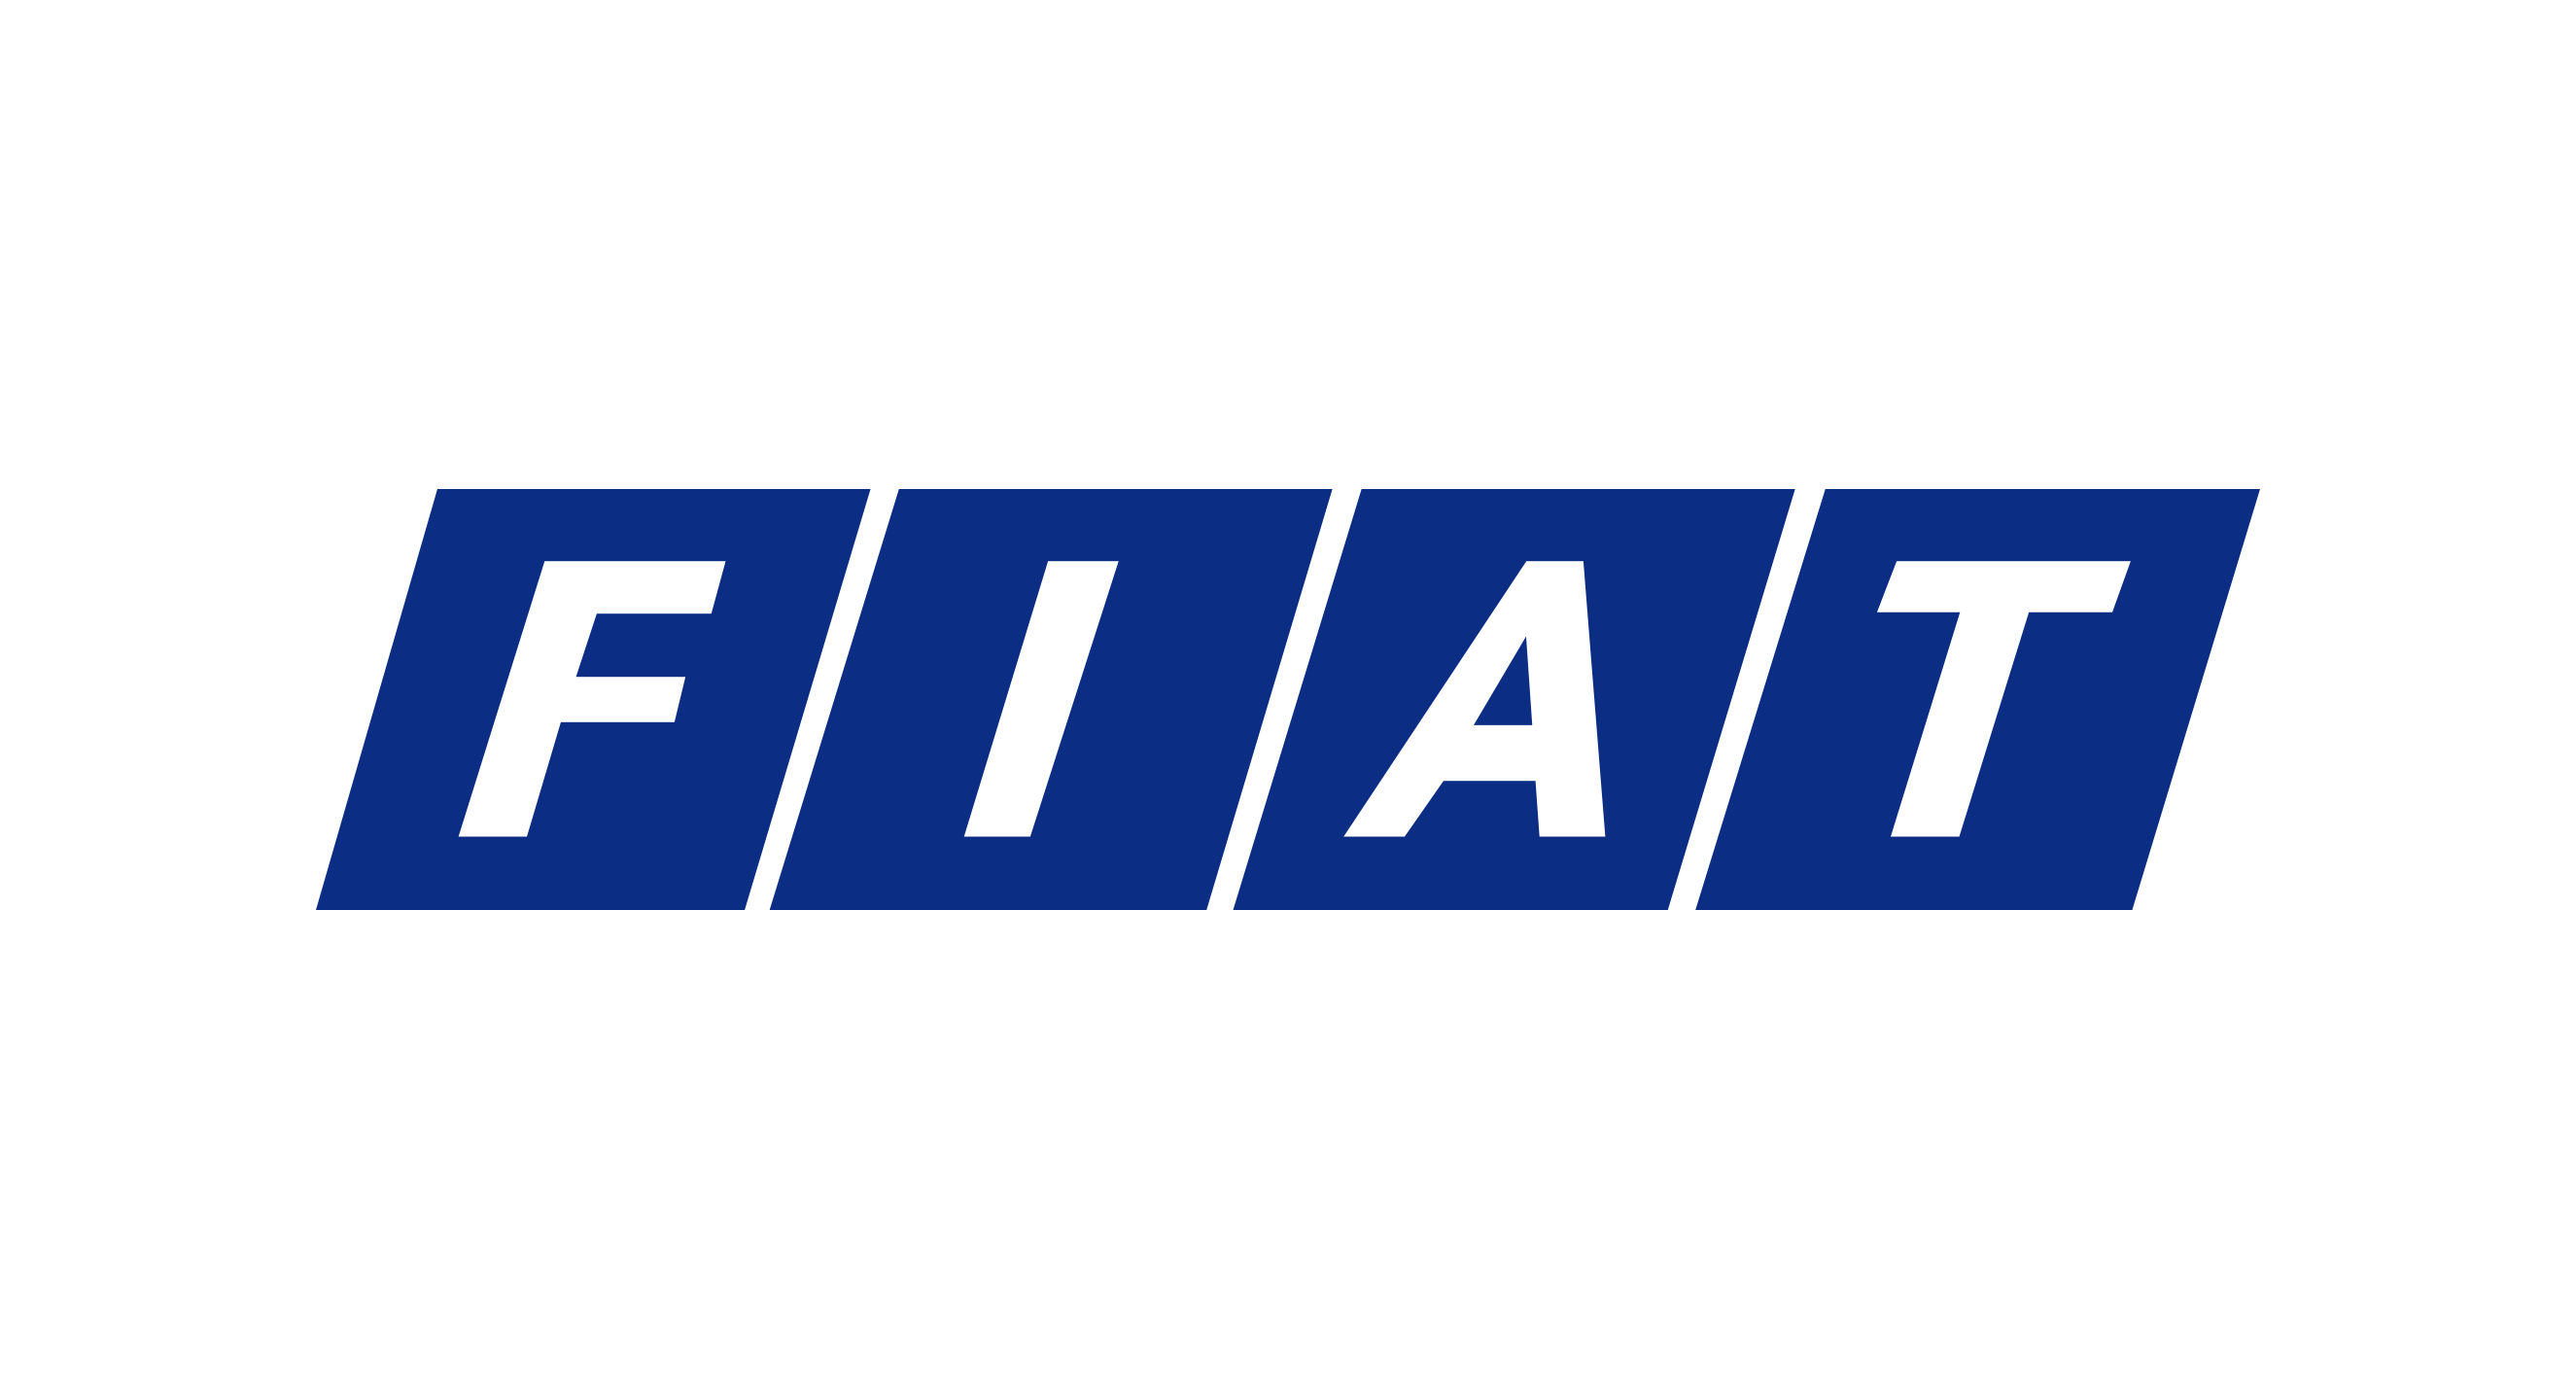 Fiat Logo (1968) 2560x1440 HD png - Fiat HD PNG